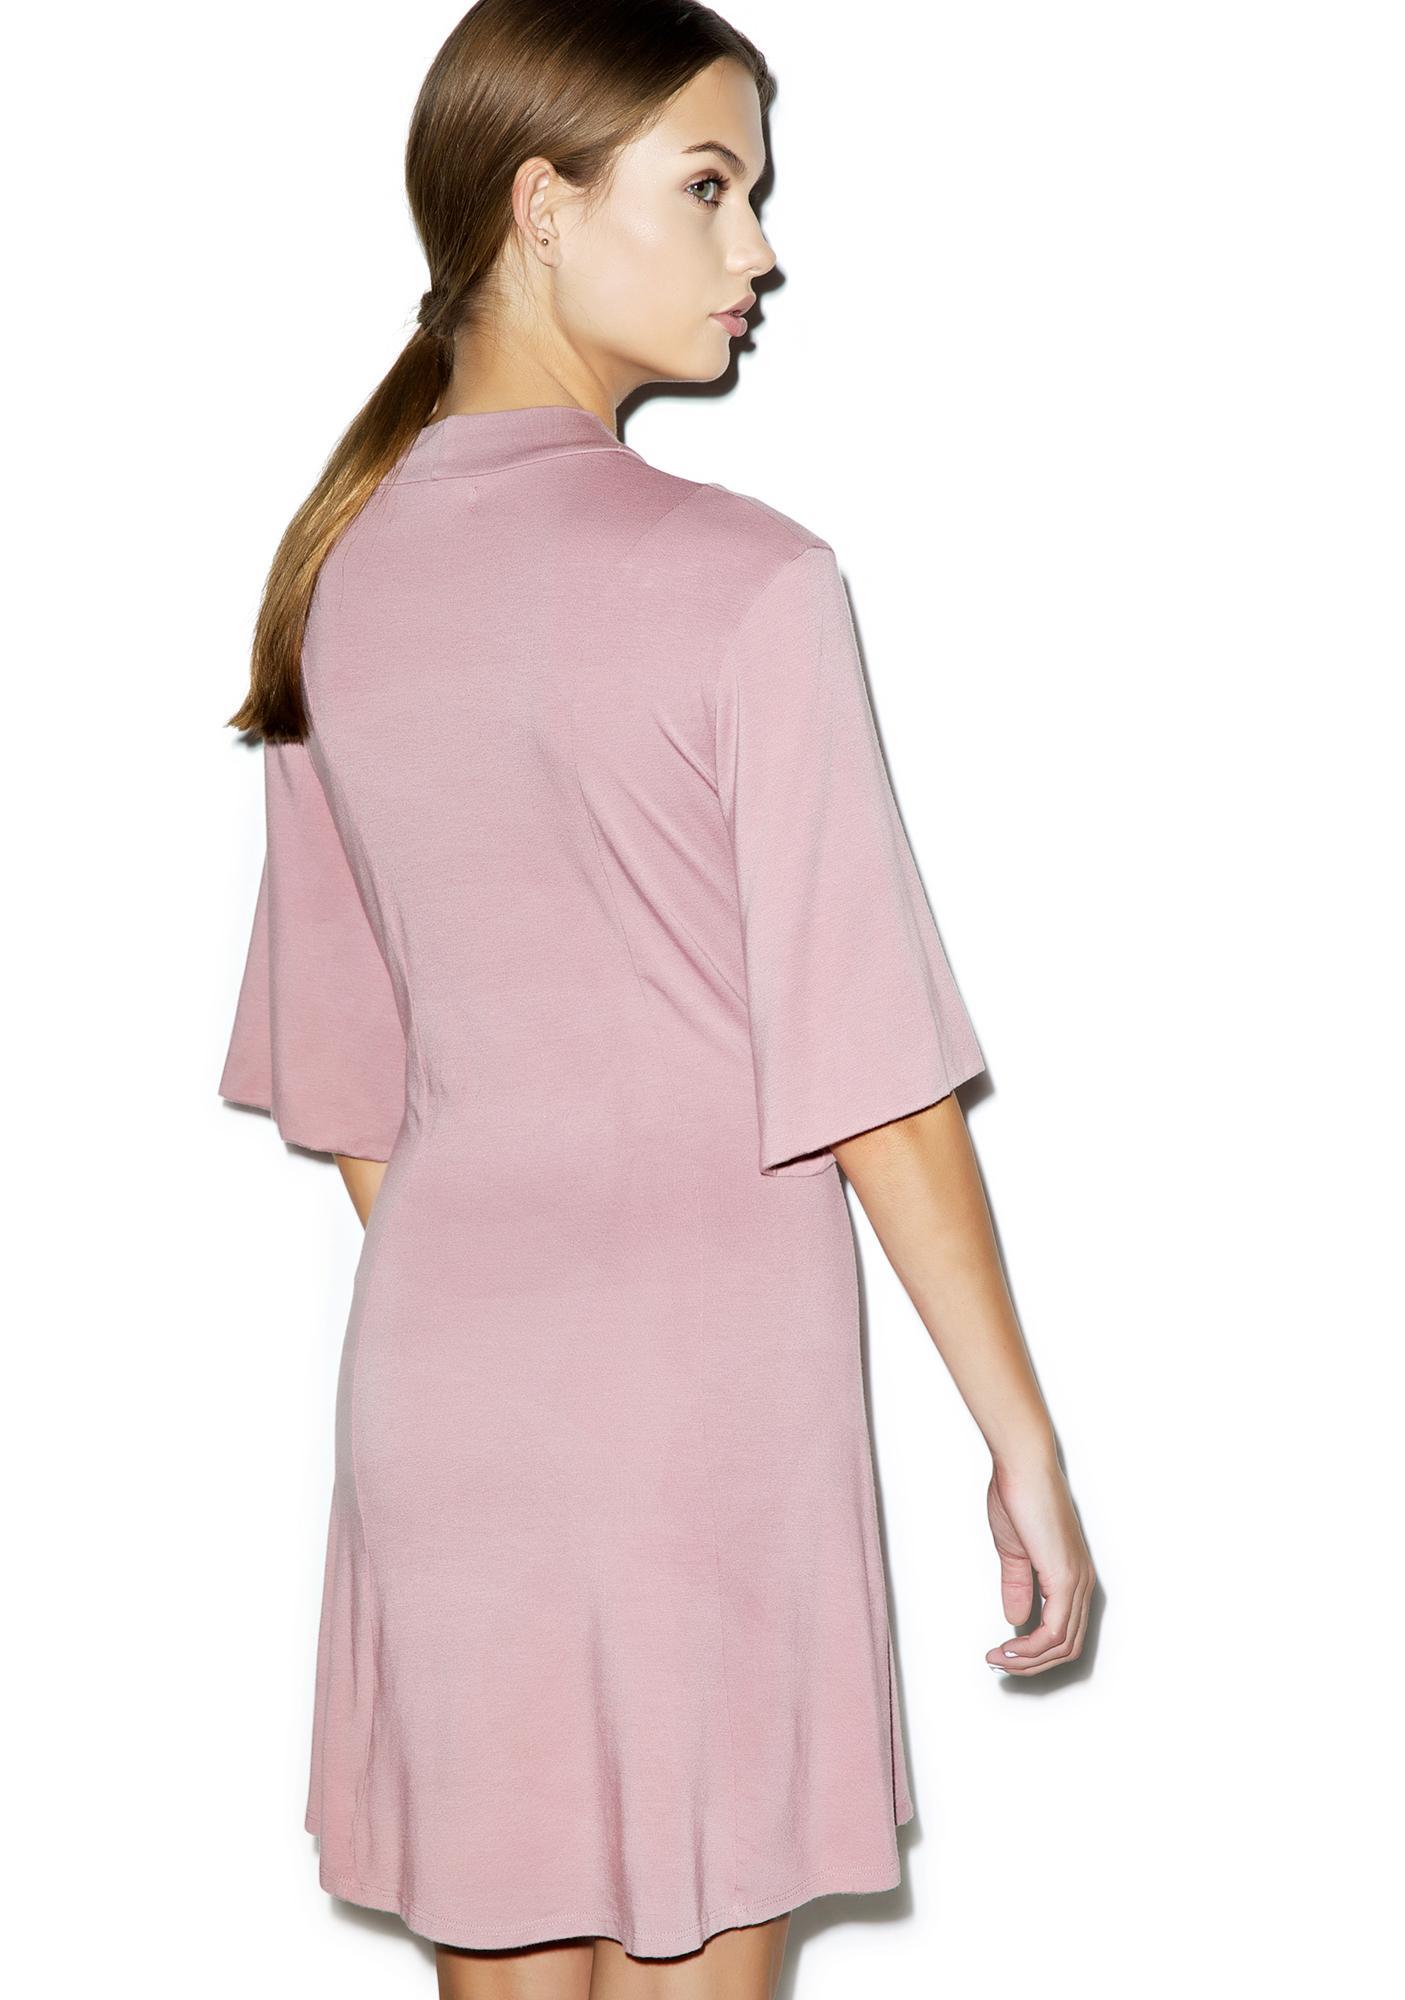 Groceries Apparel Gramercy Dress